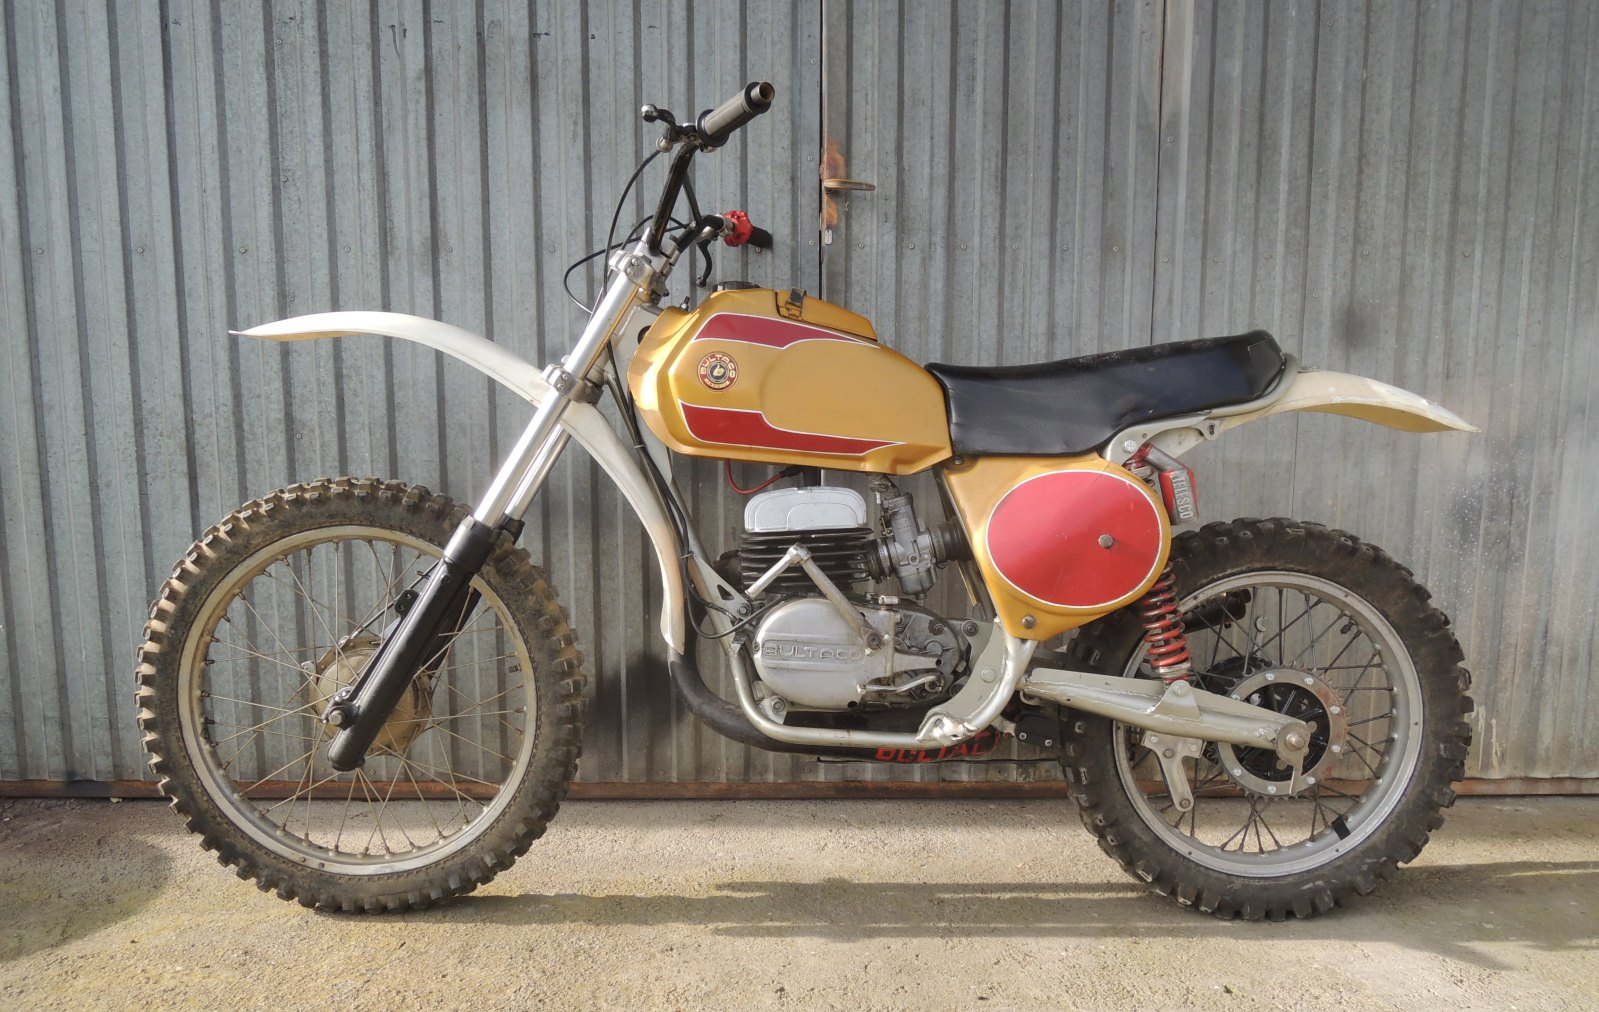 Bultaco Frontera Gold Medal 250 - By Jorok Dght76